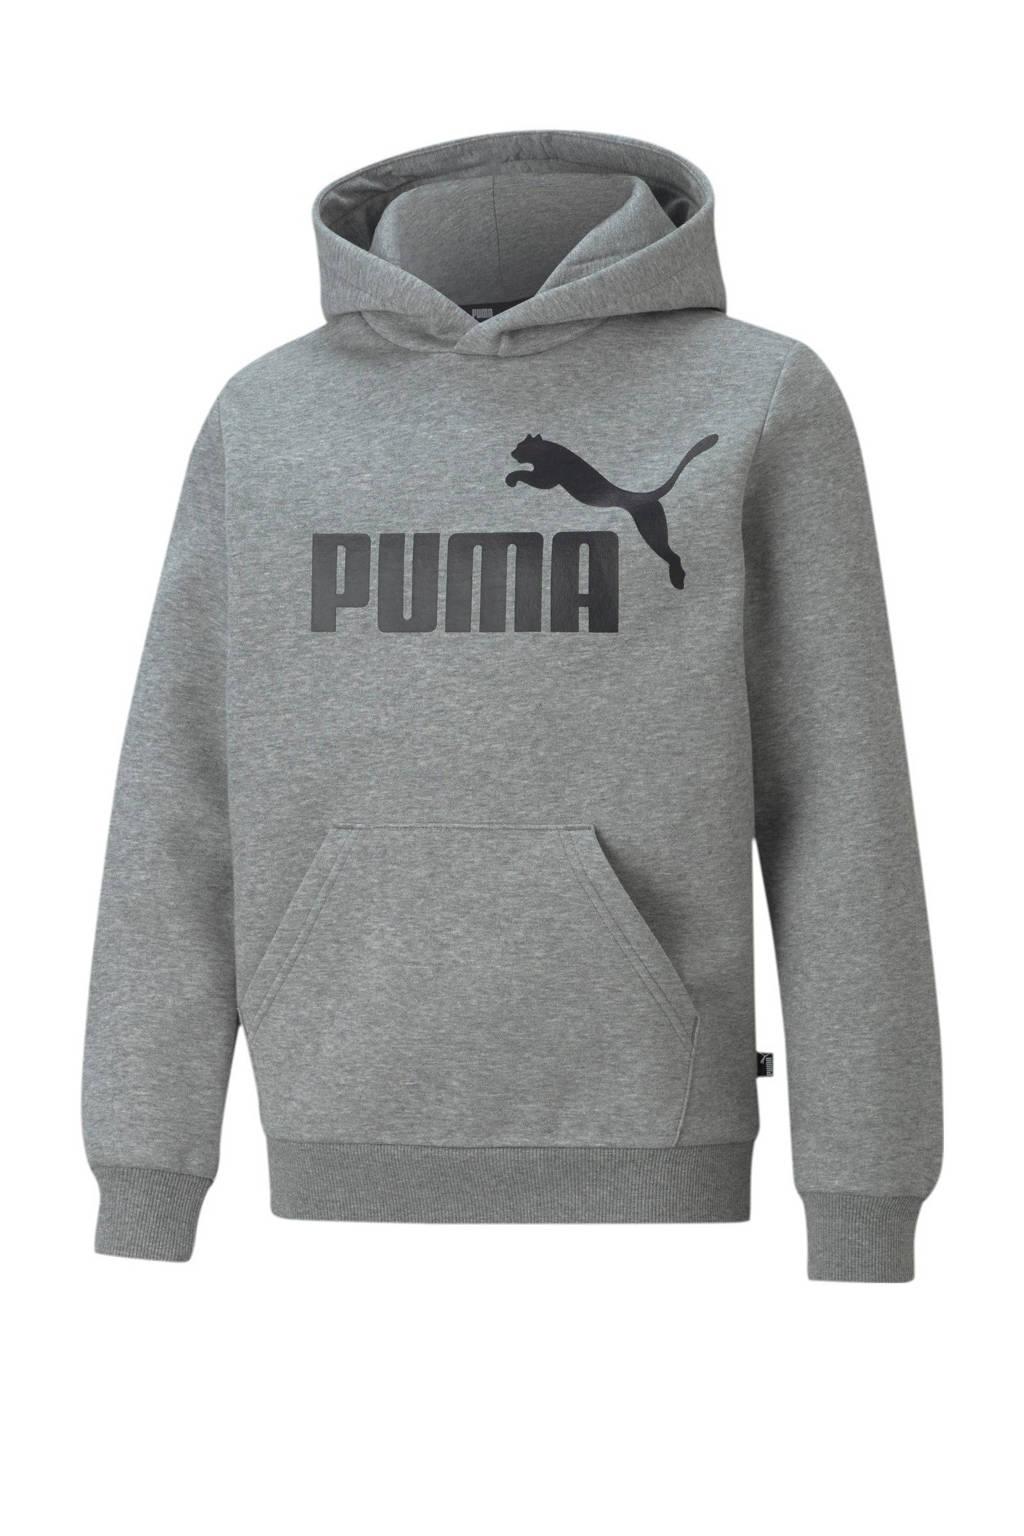 Puma hoodie grijs melange, Grijs melange